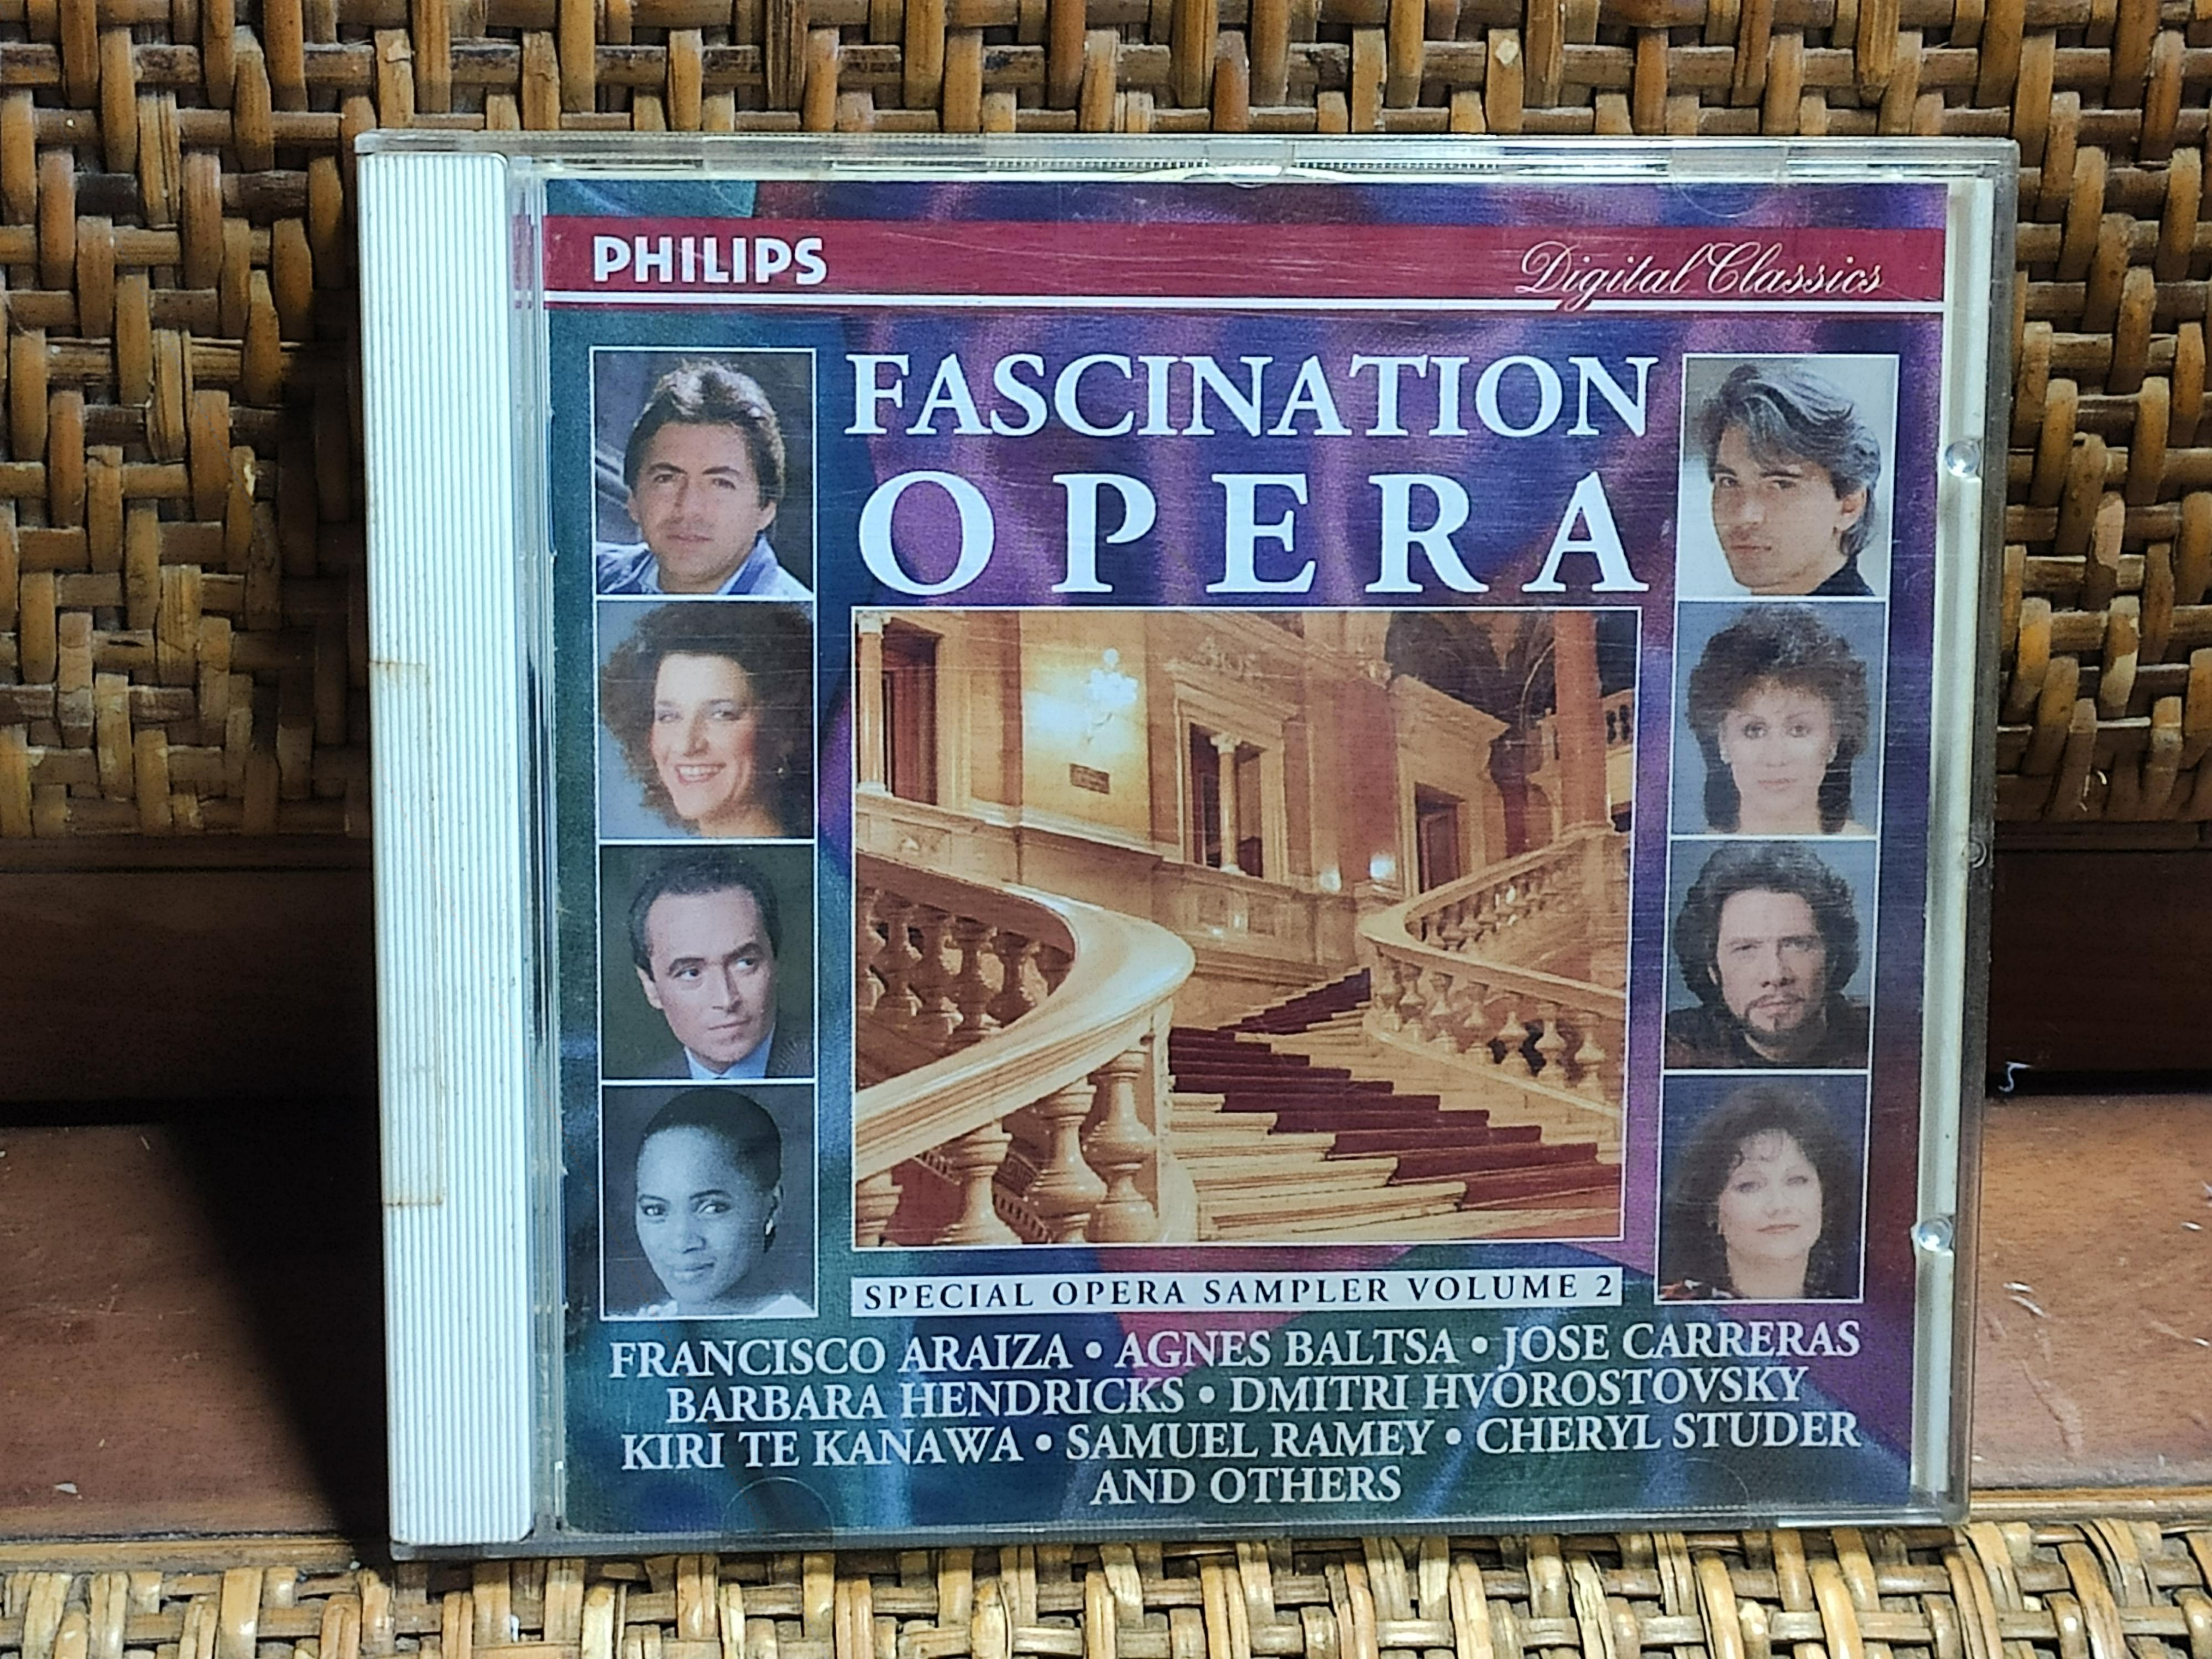 FASCINATION OPERA SPECIAL OPERA SAMPLER VOLUME 2 德國版